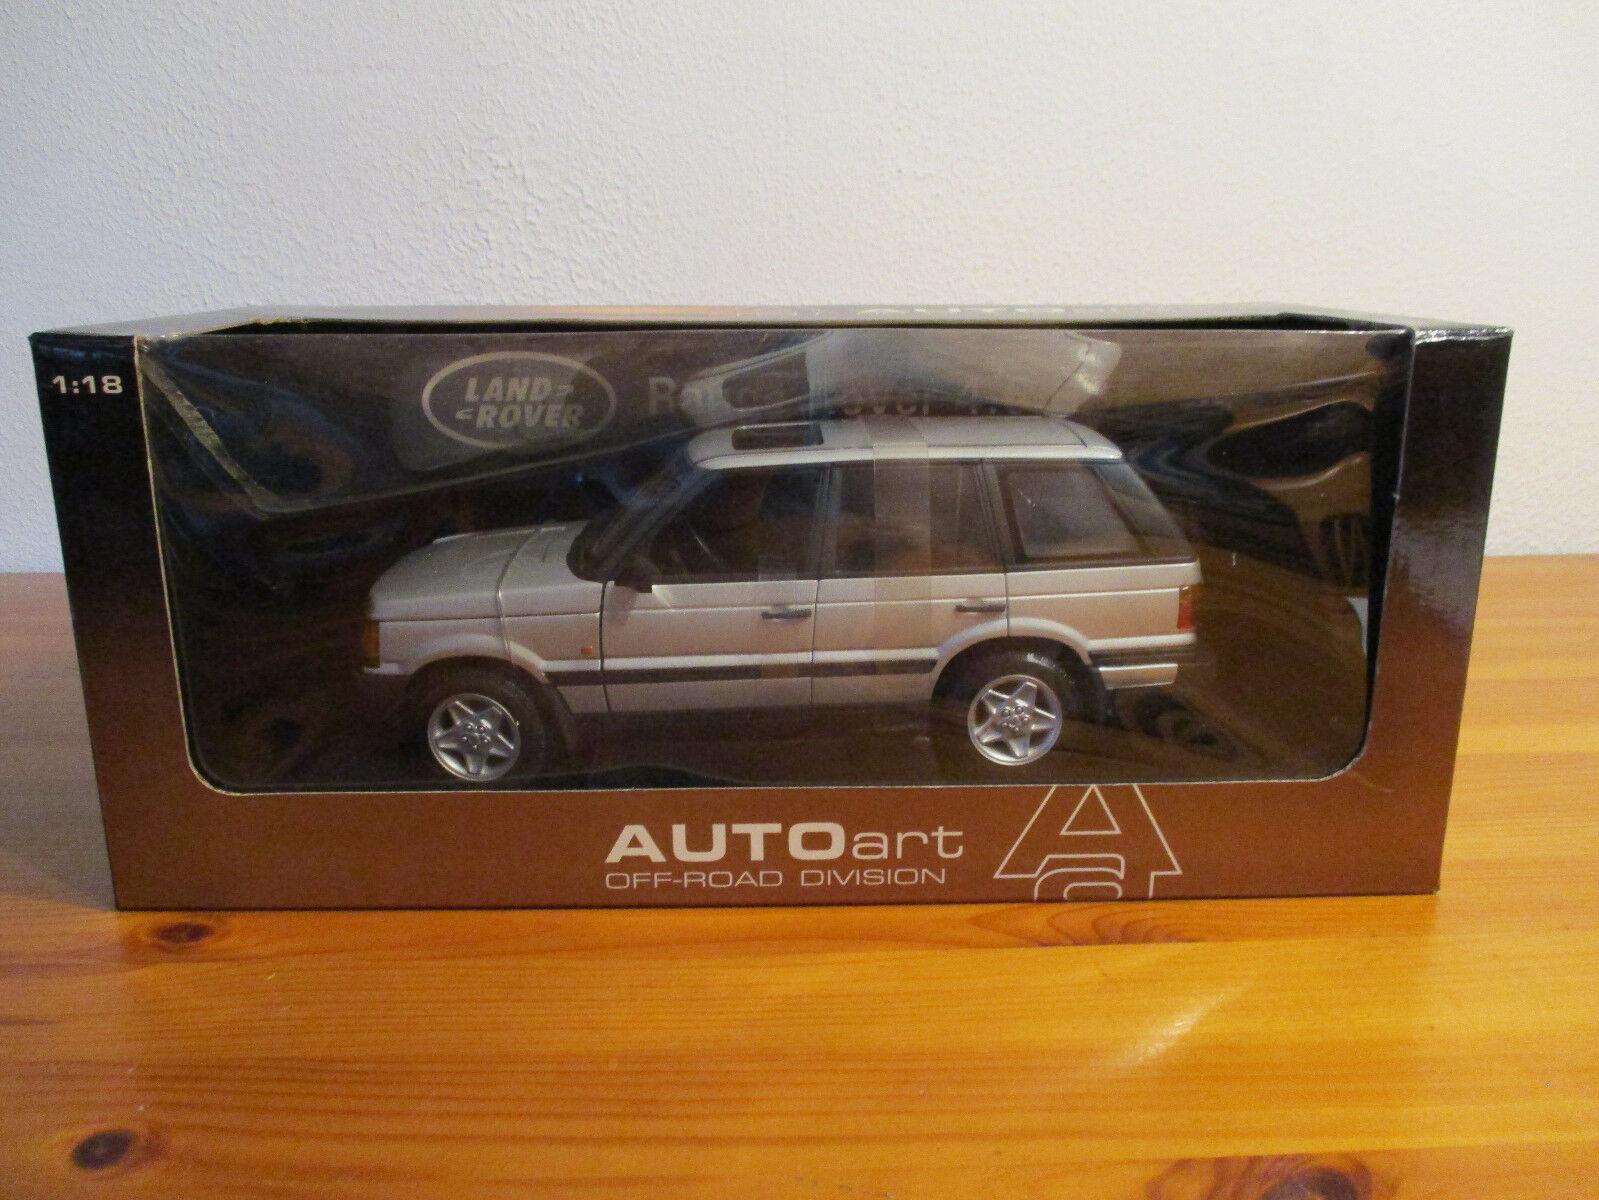 (Gor) 1 18 Autoart Land Rover Range Rover 4.6 HSE LH Neuf neuf dans sa boîte